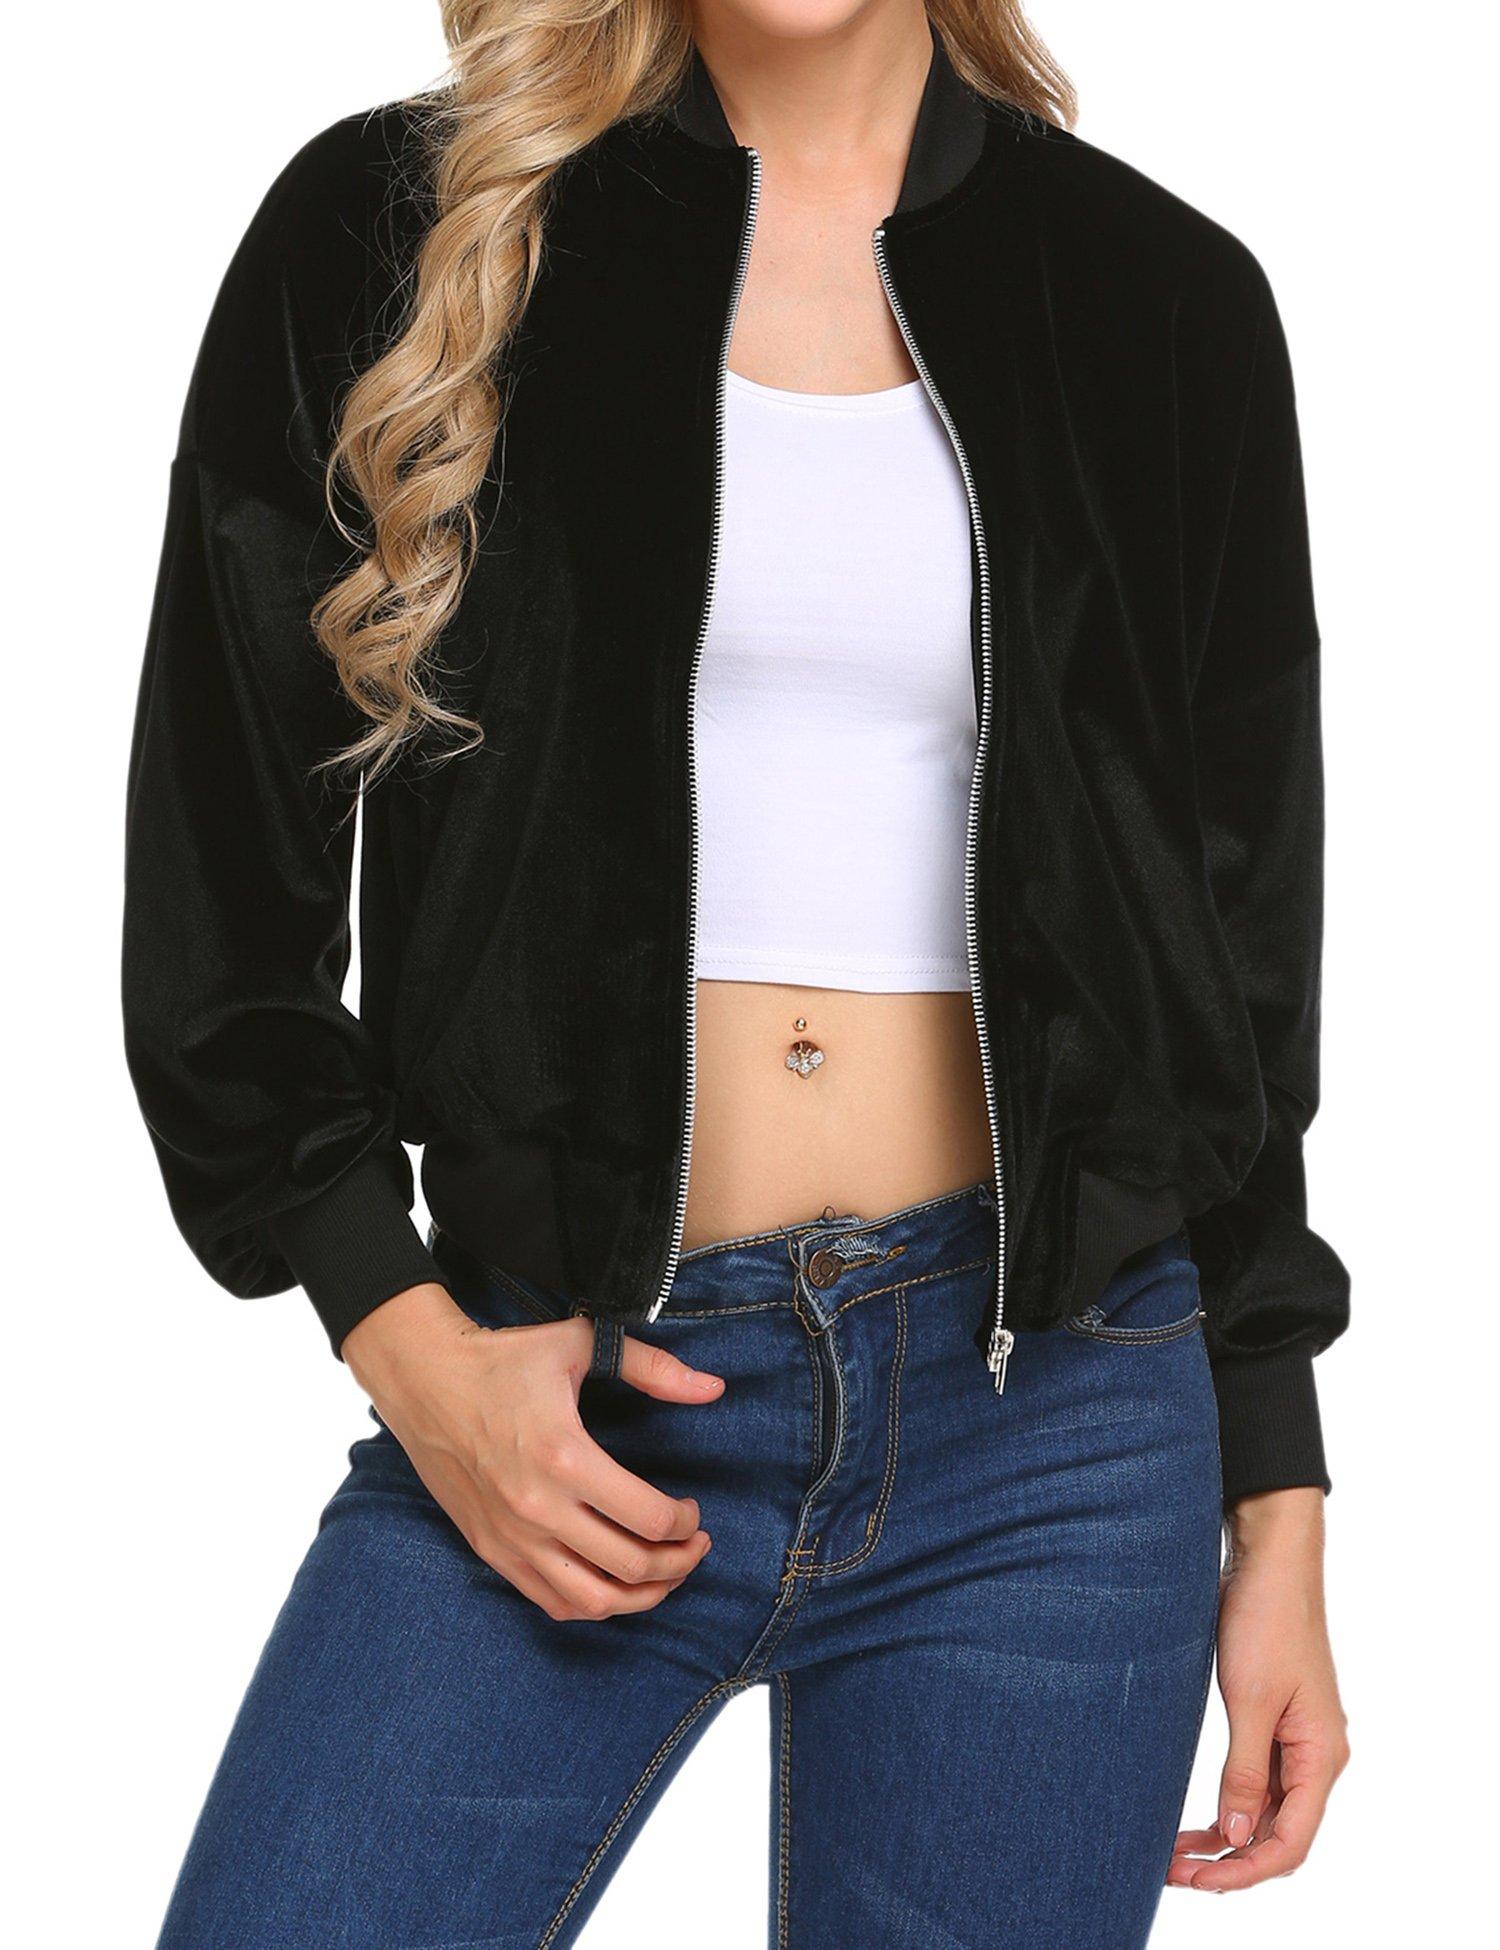 Beyove Women Fashion Classic Bomber Jacket Slim Bike Motorcycle Coat Outwear Black XXL